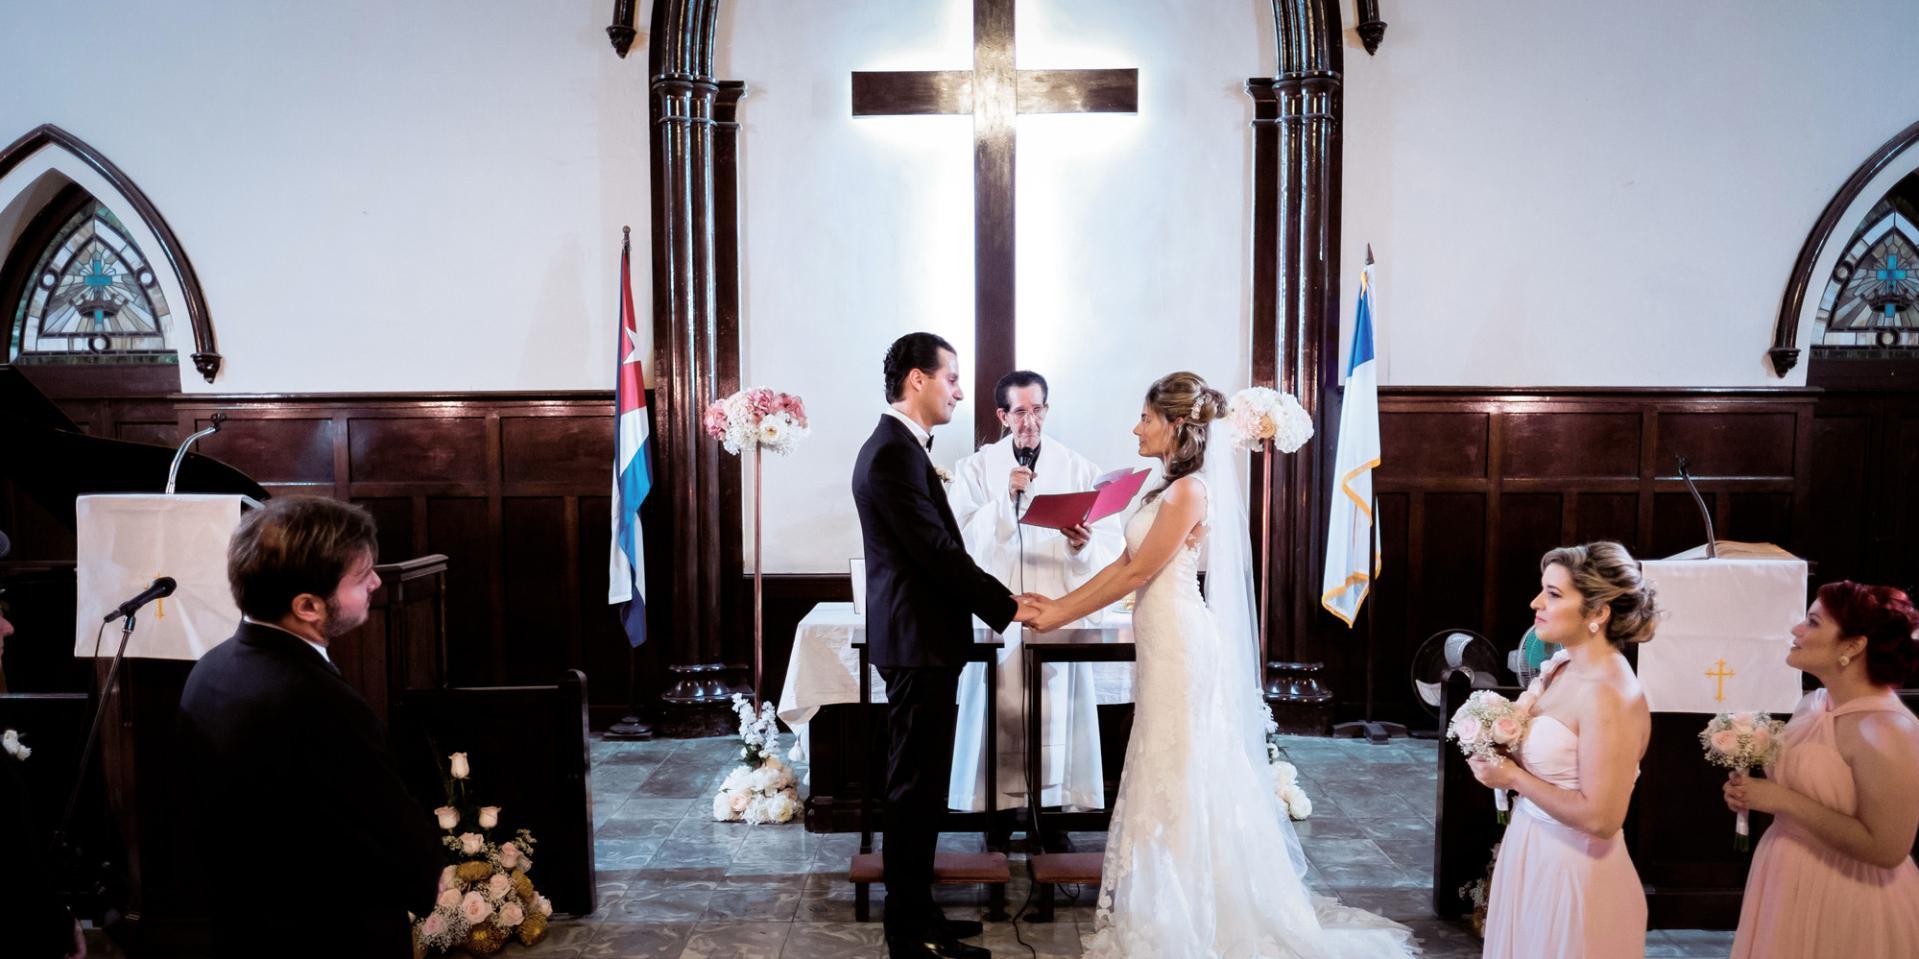 bodas-sin-clasificar-sin-tema-cuba-27601.jpg